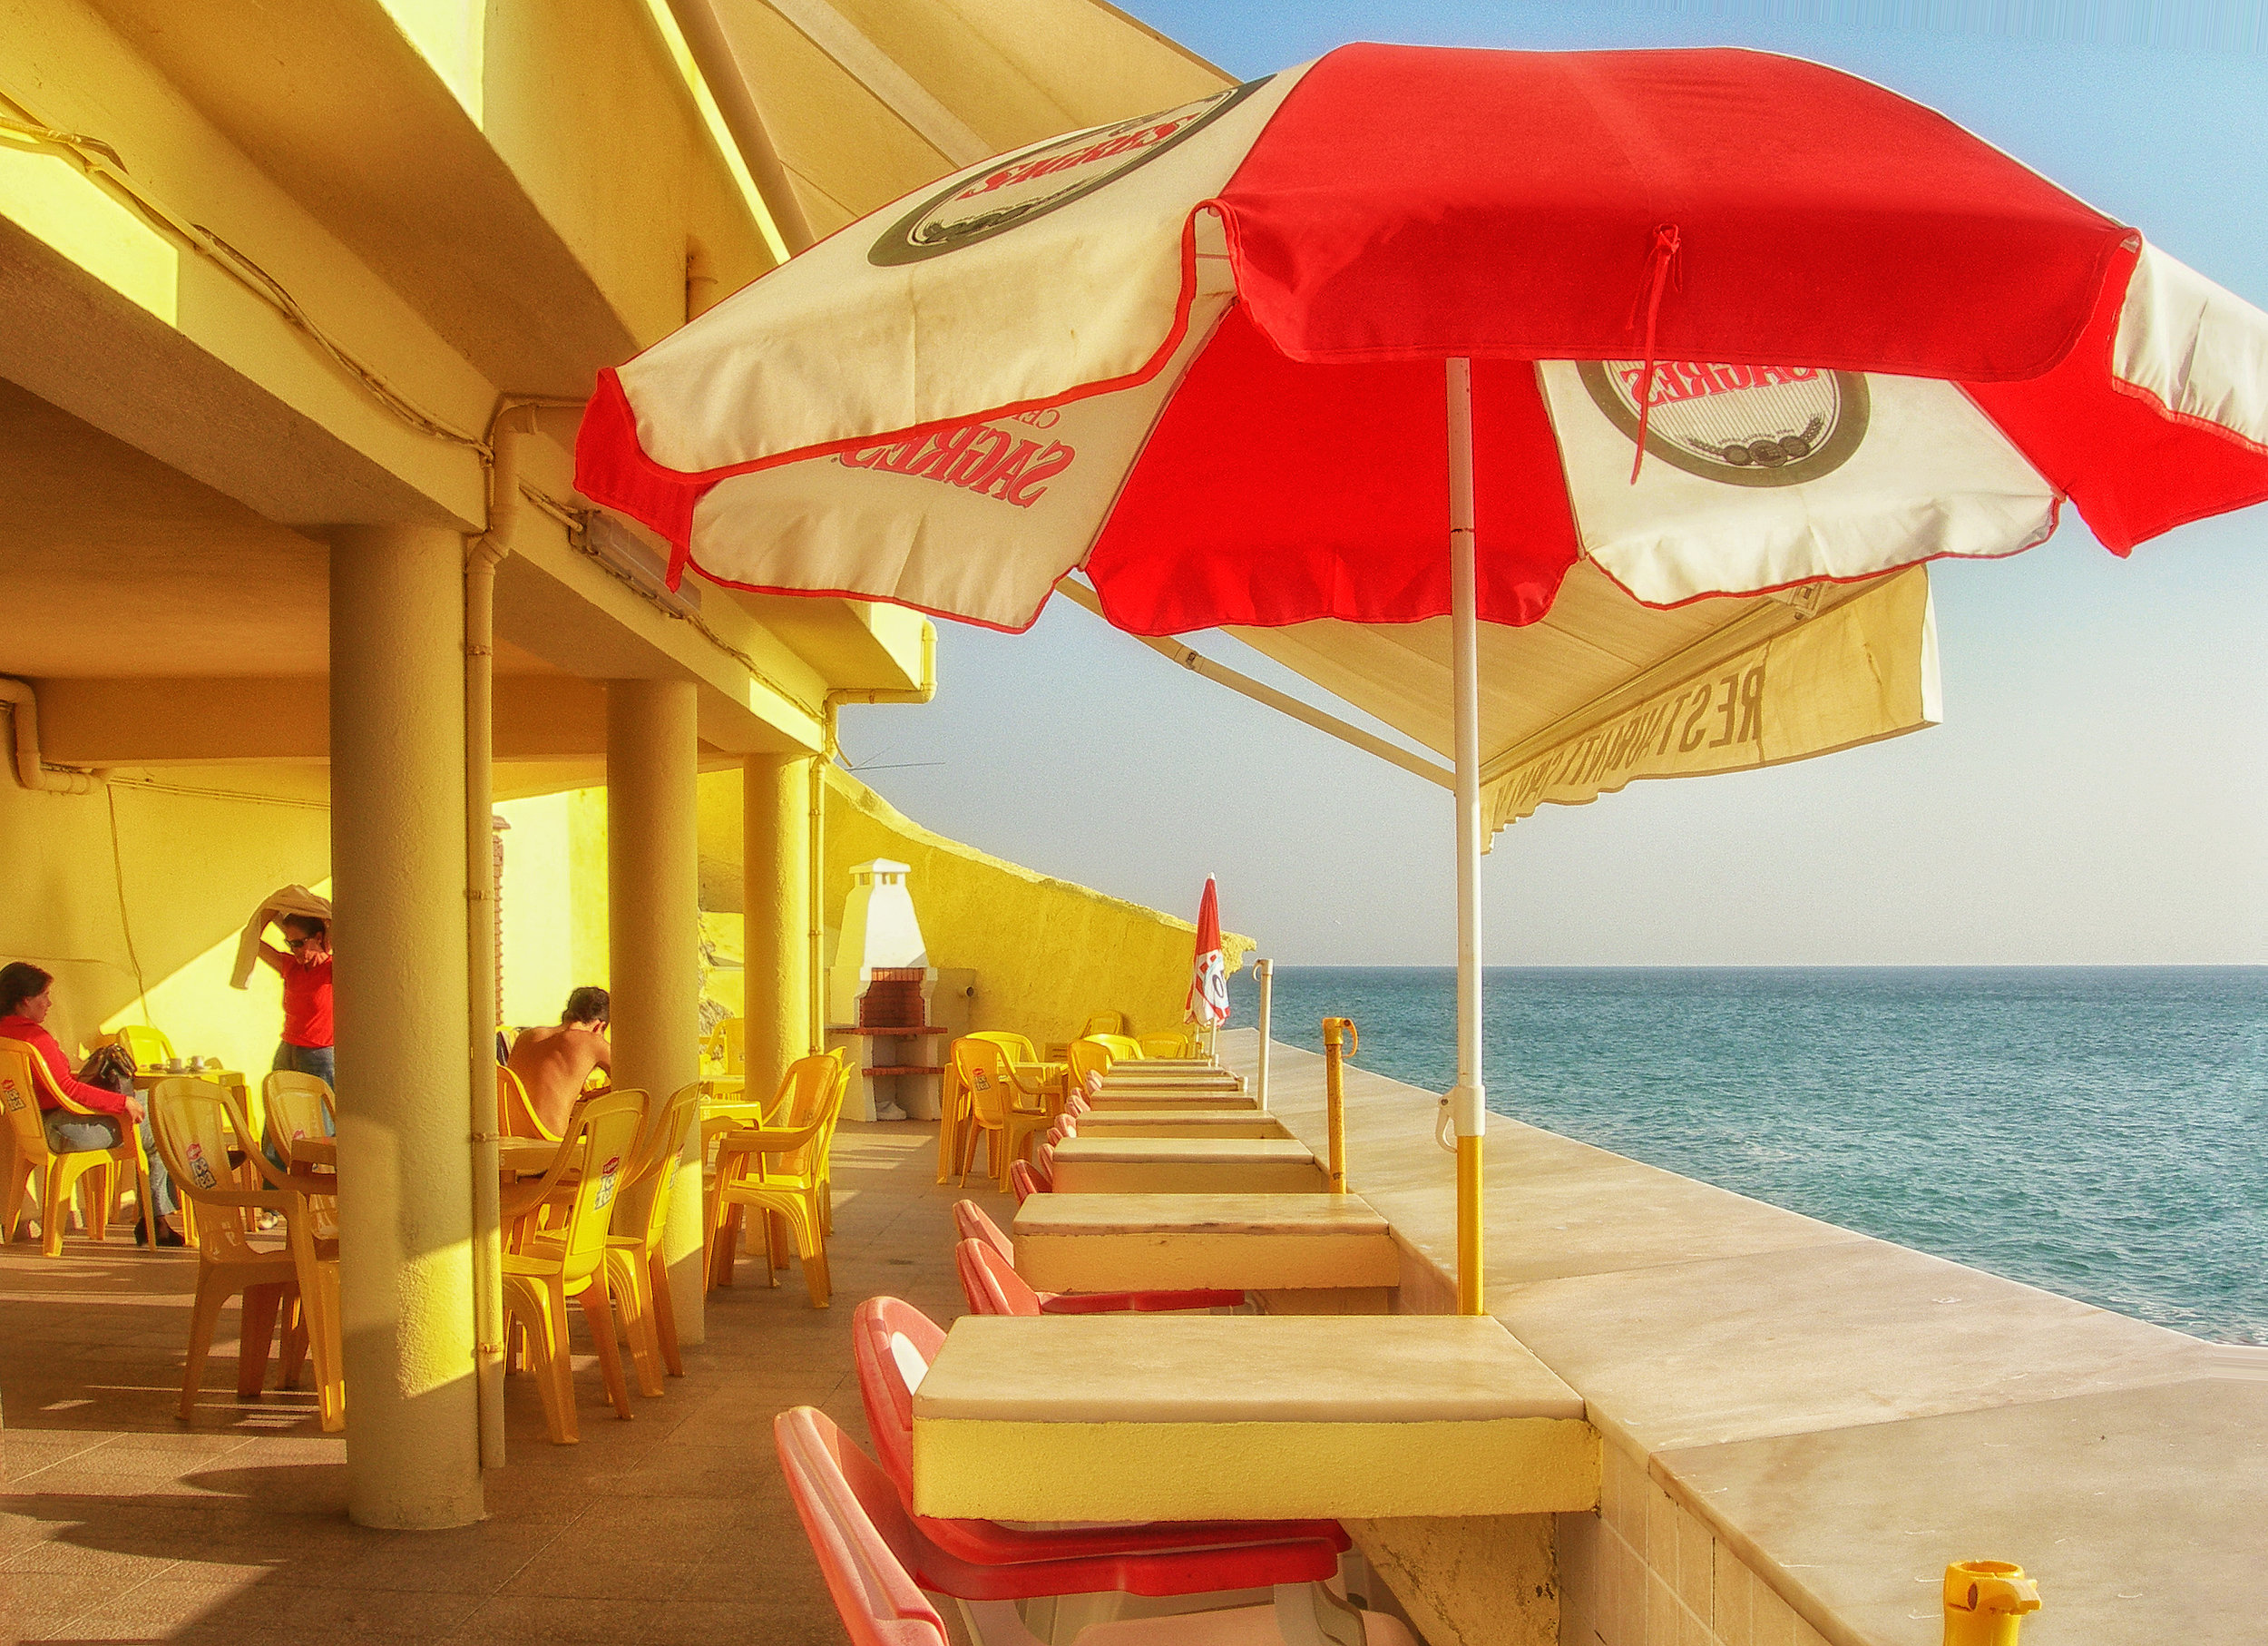 Susannah-Mira_Lisbon-seaside-cafe.jpg